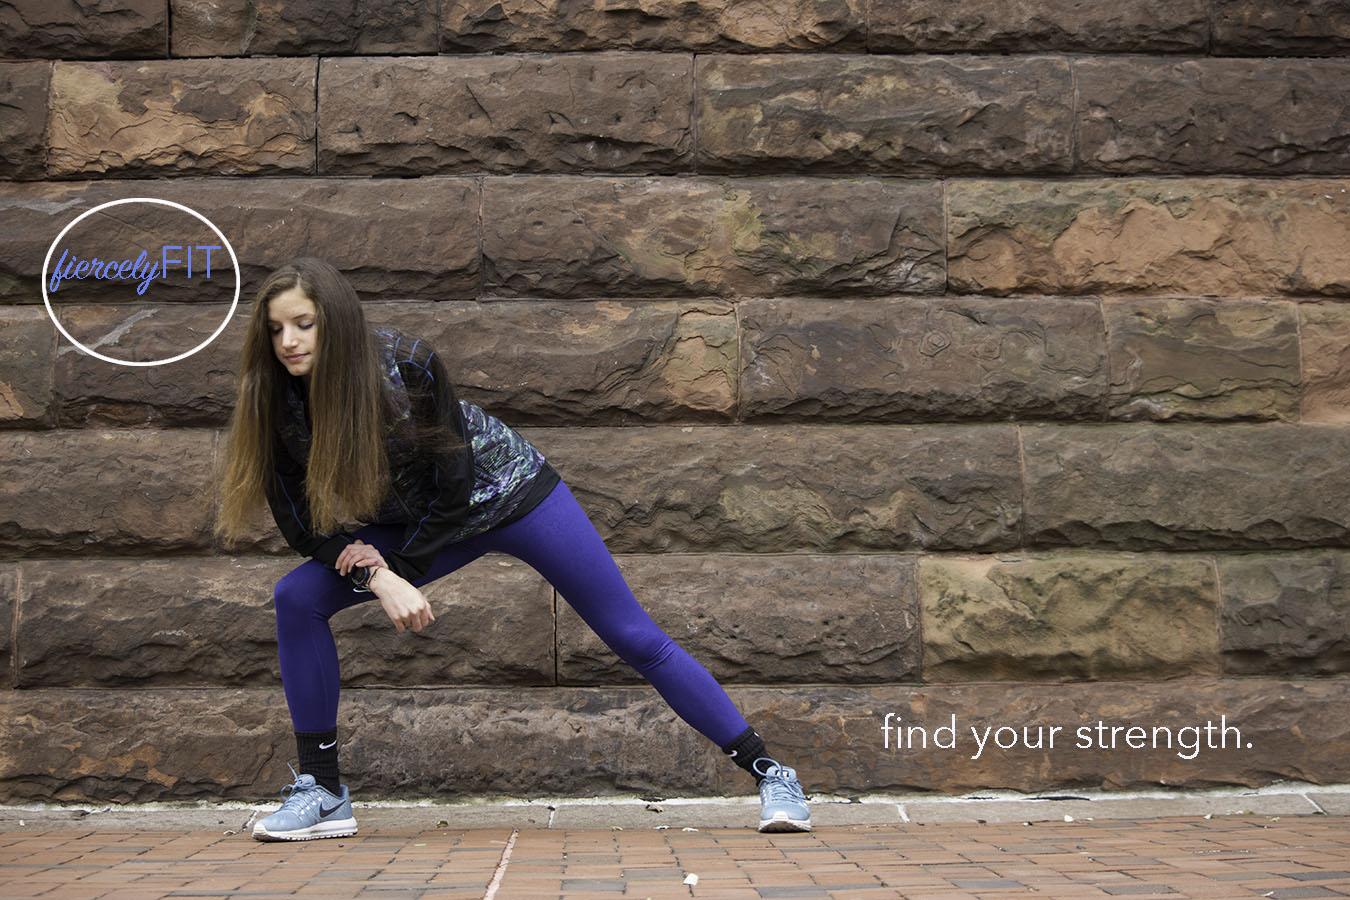 Joy_Lewis_Branding_Athletic_Wear_Fiercly_Fit_Stretching